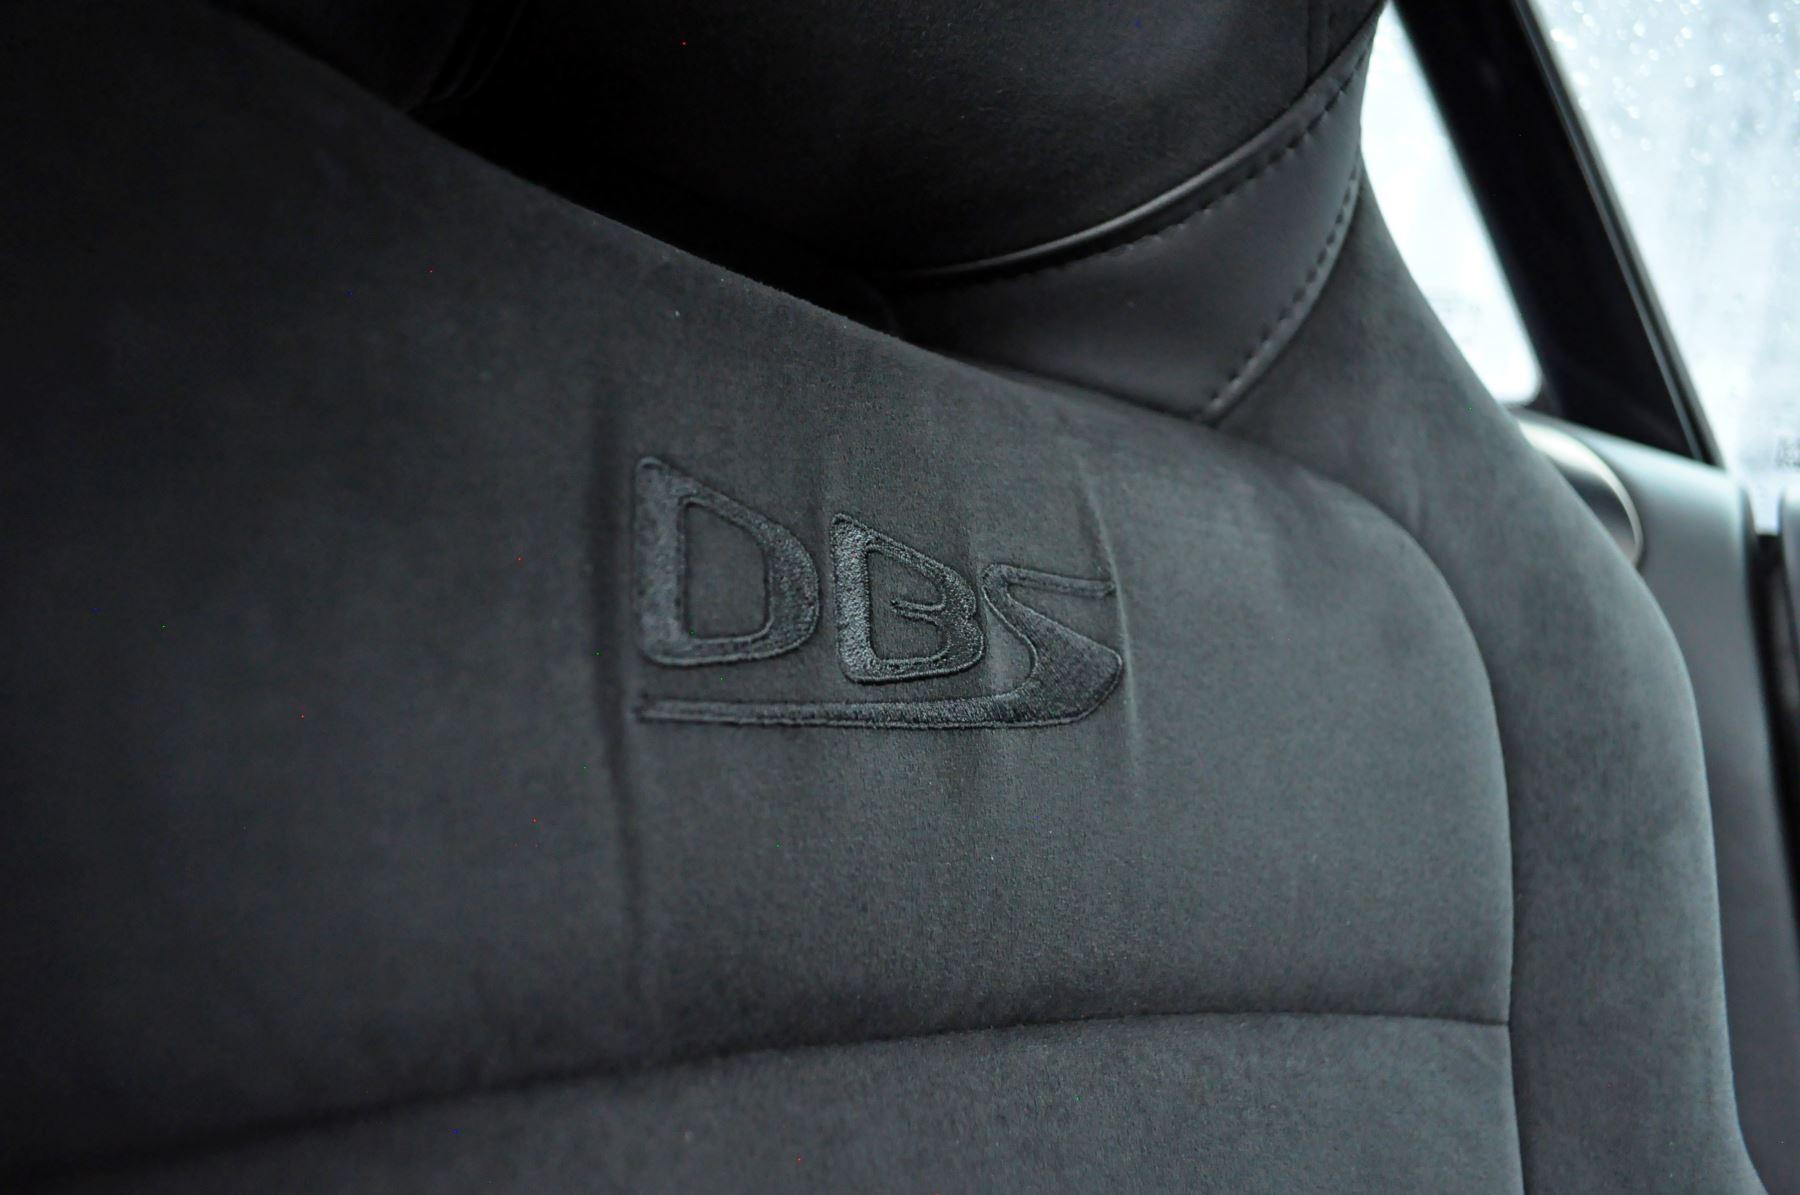 Aston Martin DBS V12 Superleggera 2dr Touchtronic image 22